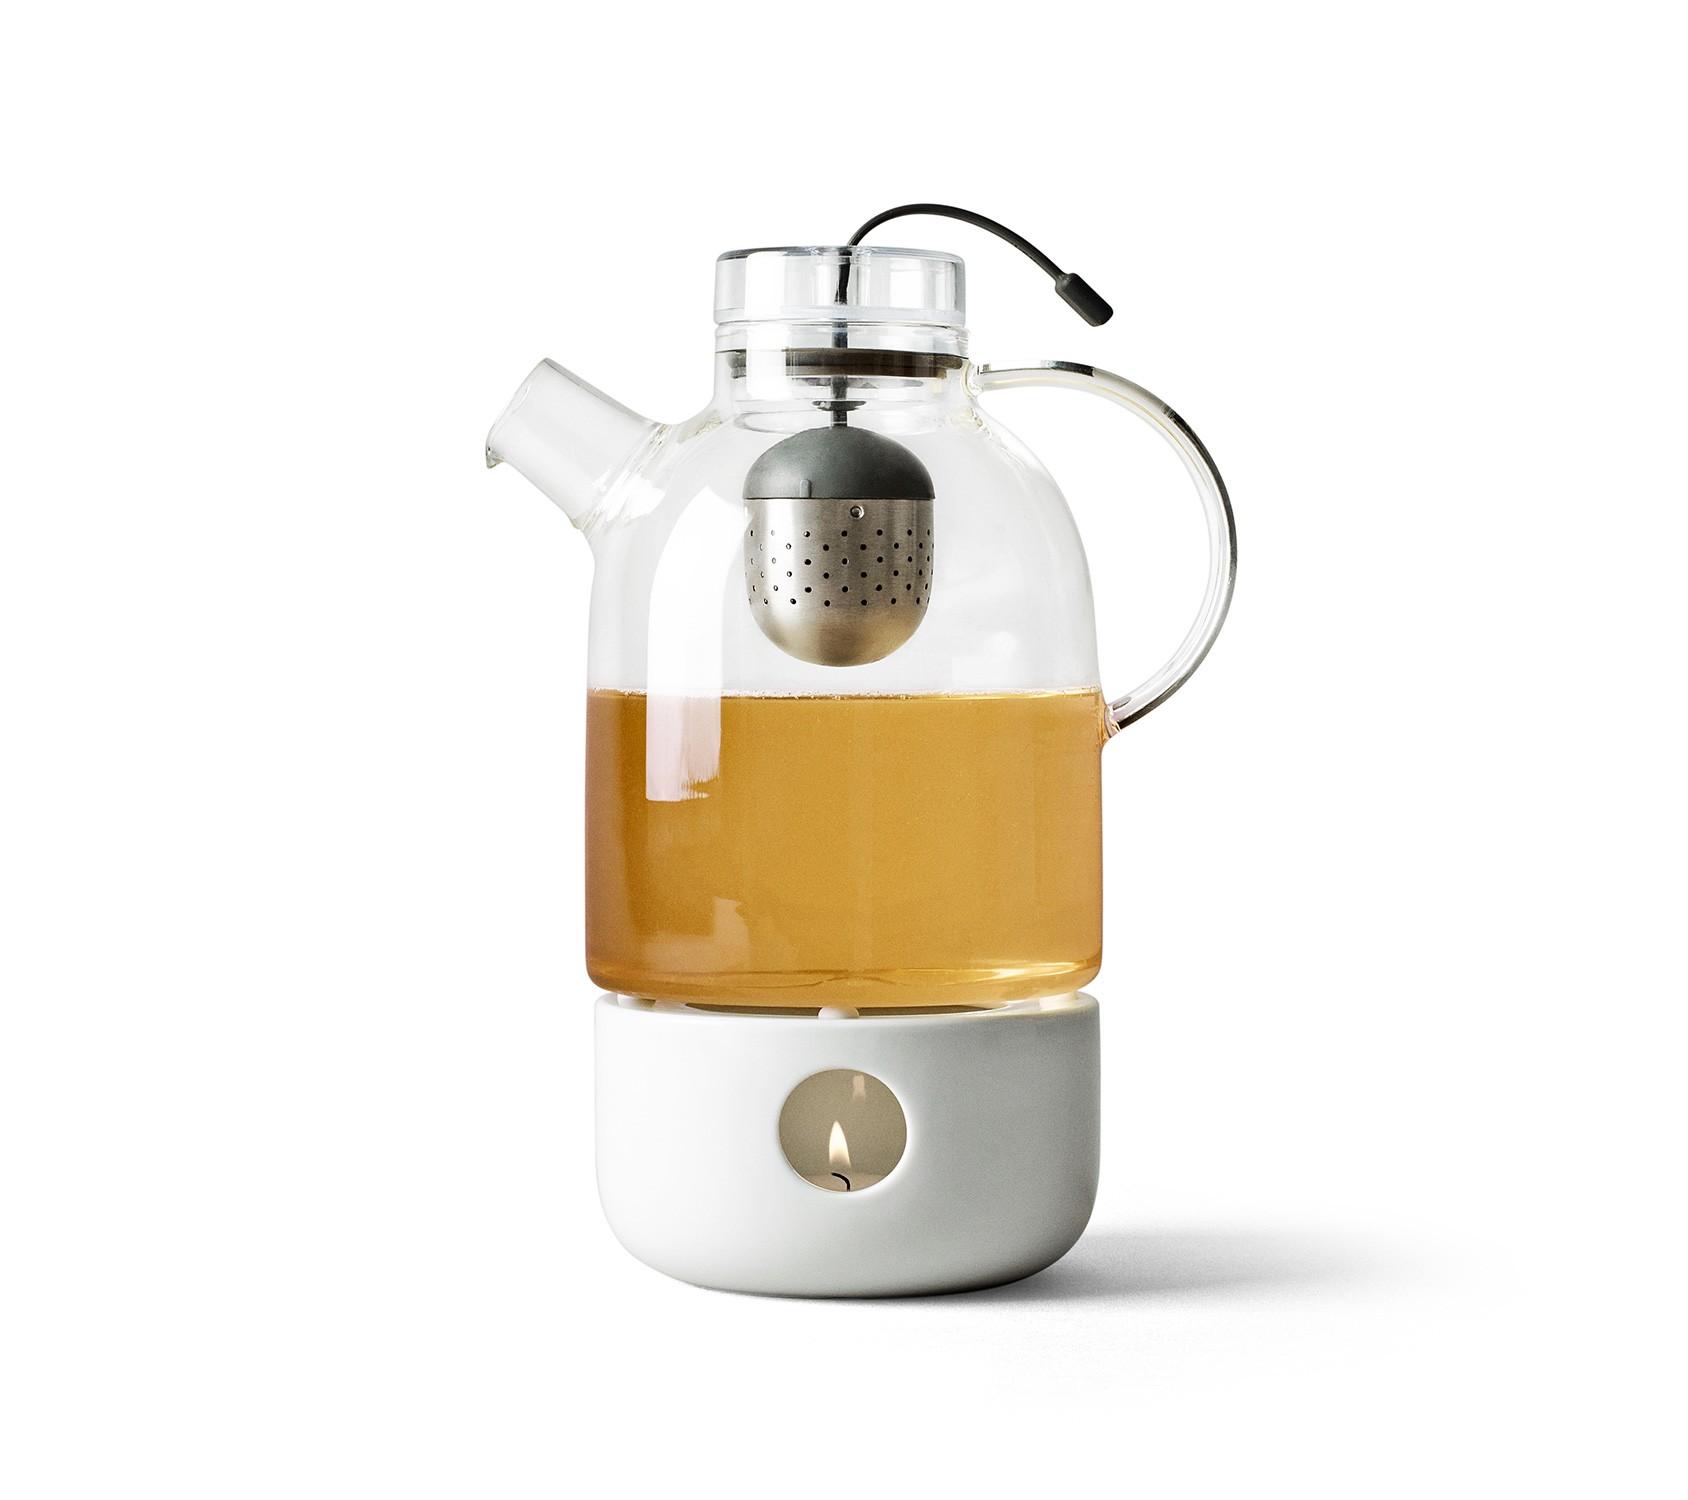 menu kettle teapot 1 5l teekanne mit integriertem tee ei. Black Bedroom Furniture Sets. Home Design Ideas